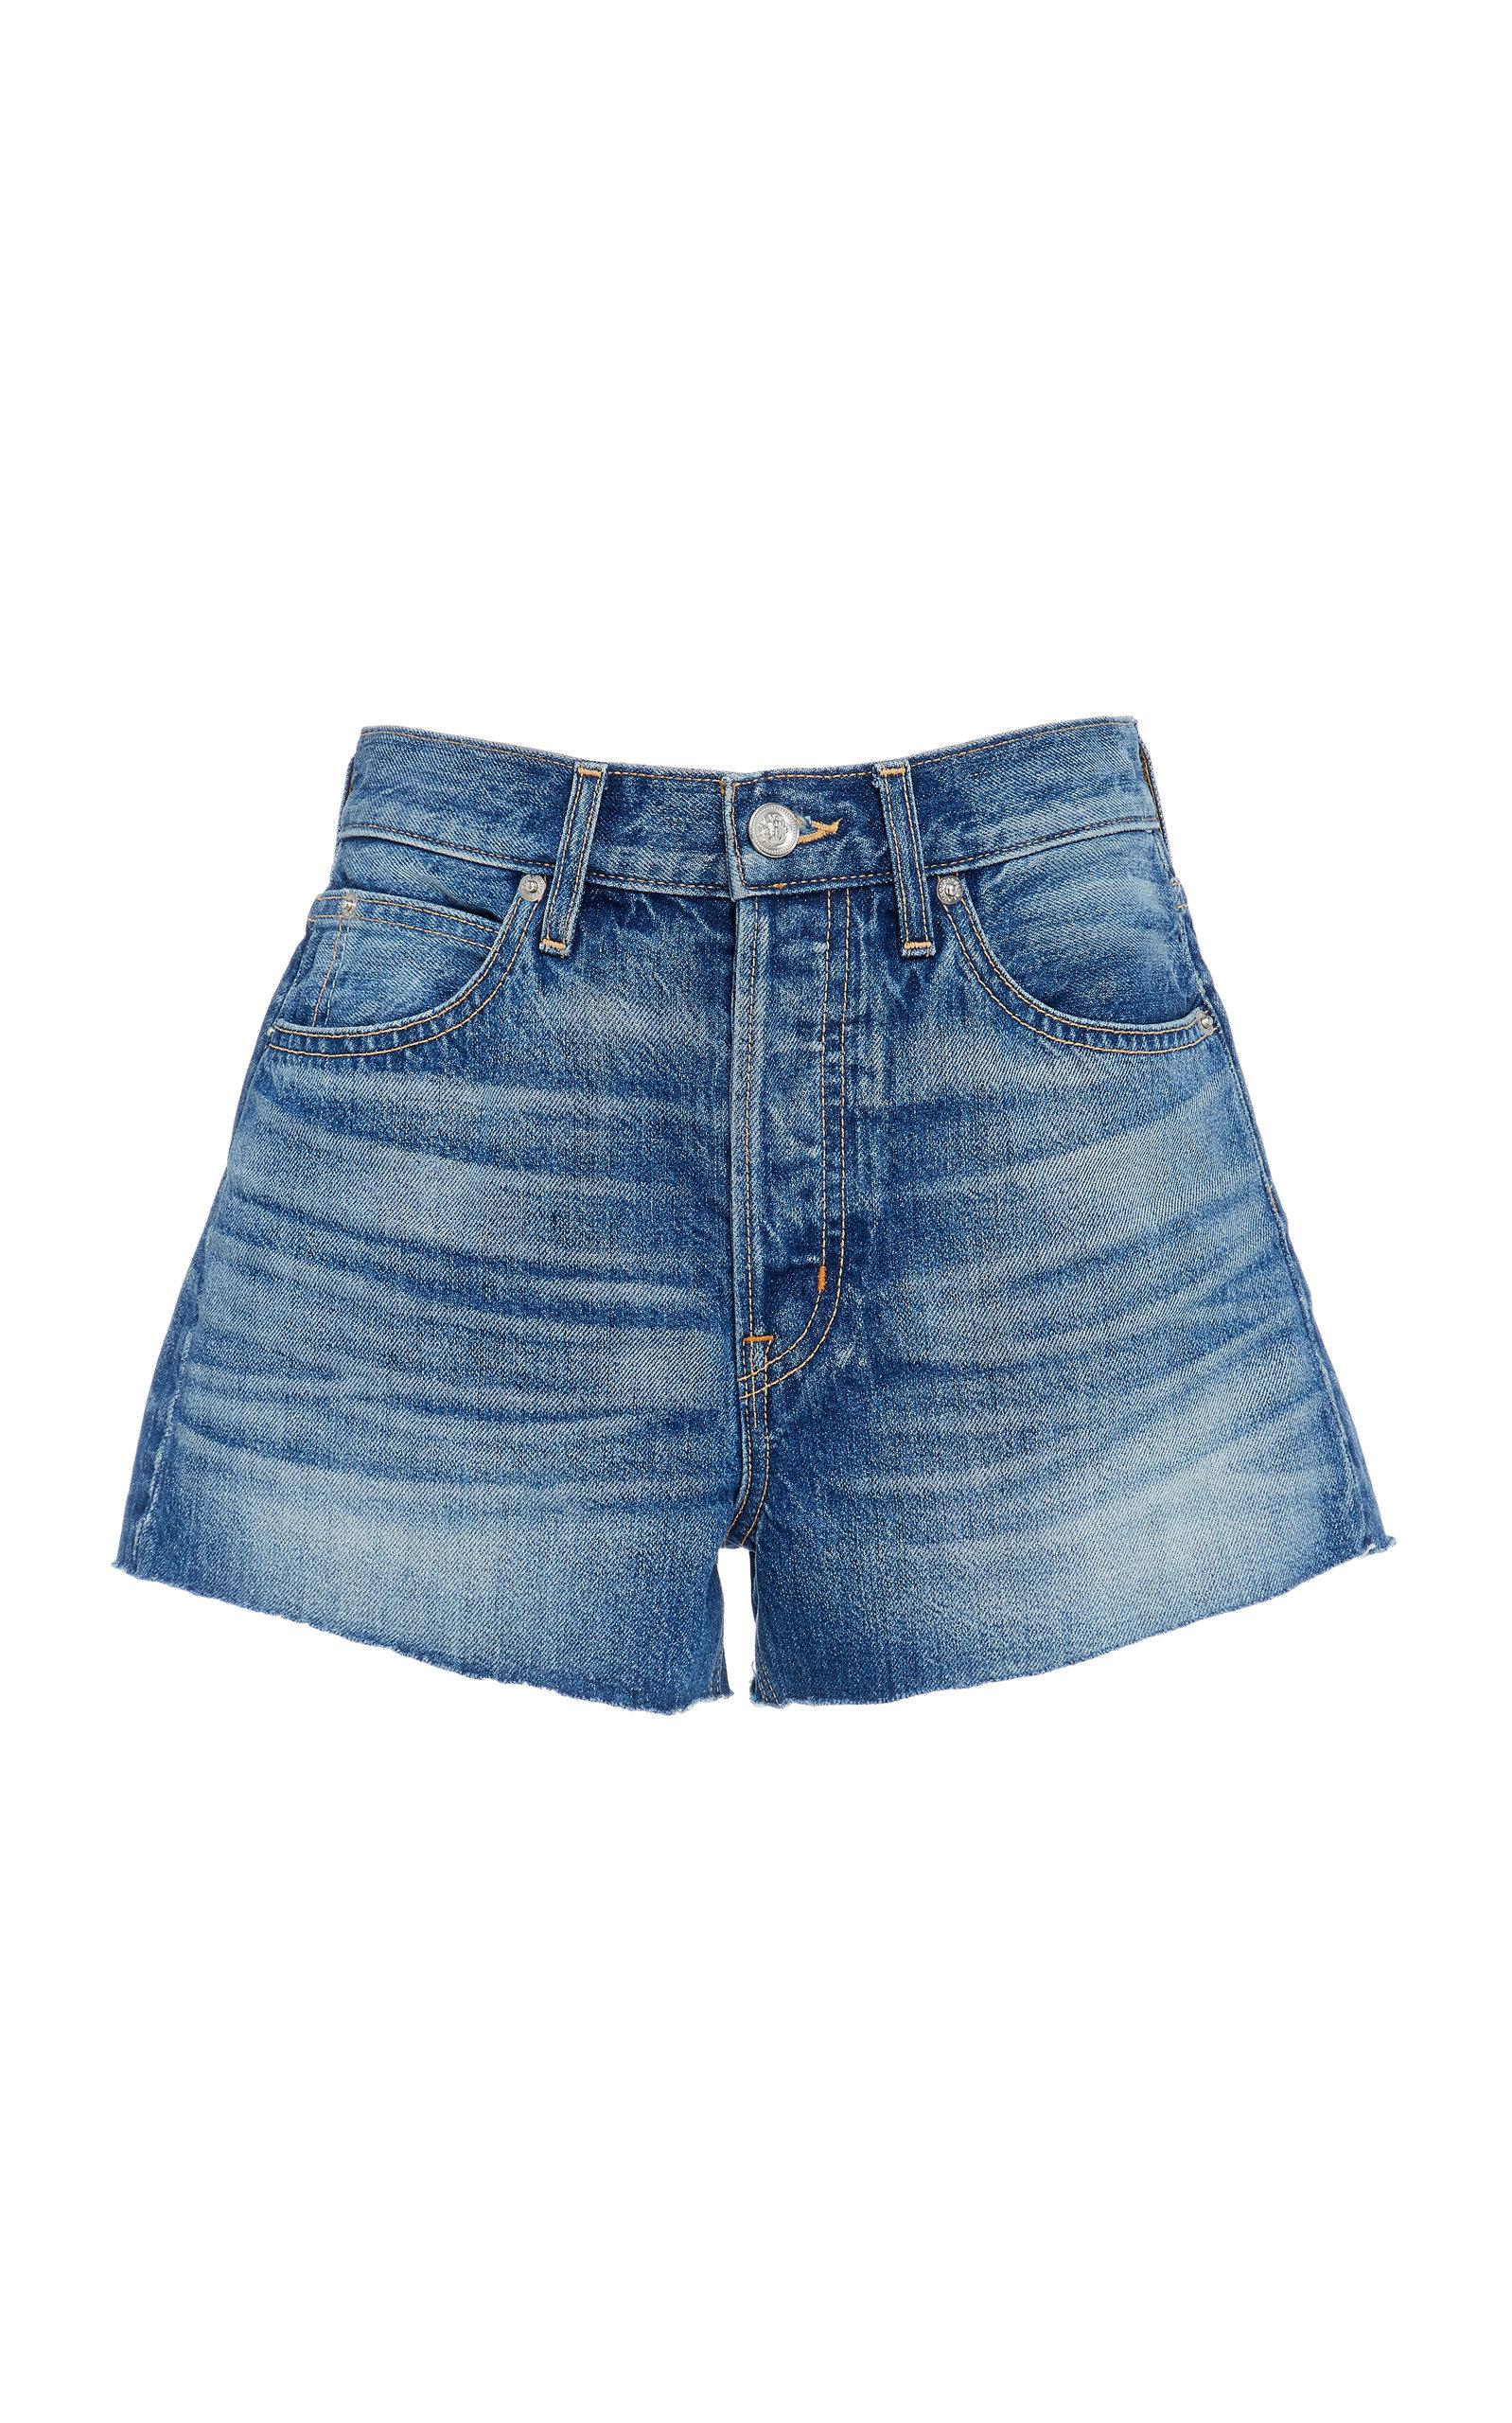 SLVRLAKE DENIM Farrah Denim Mini Shorts in Medium Wash